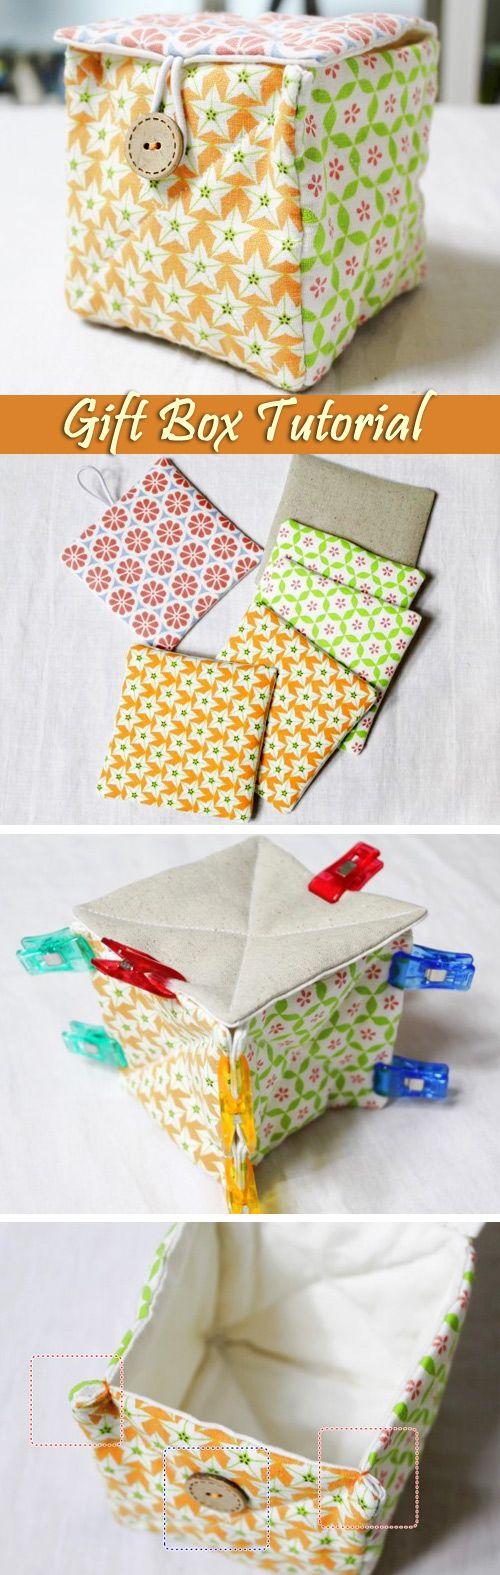 Make a Fabric Treasure Gift Box. Photo Instructions DIY step-by-step tutorial.  http://www.handmadiya.com/2016/05/diy-gift-box-tutorial.html